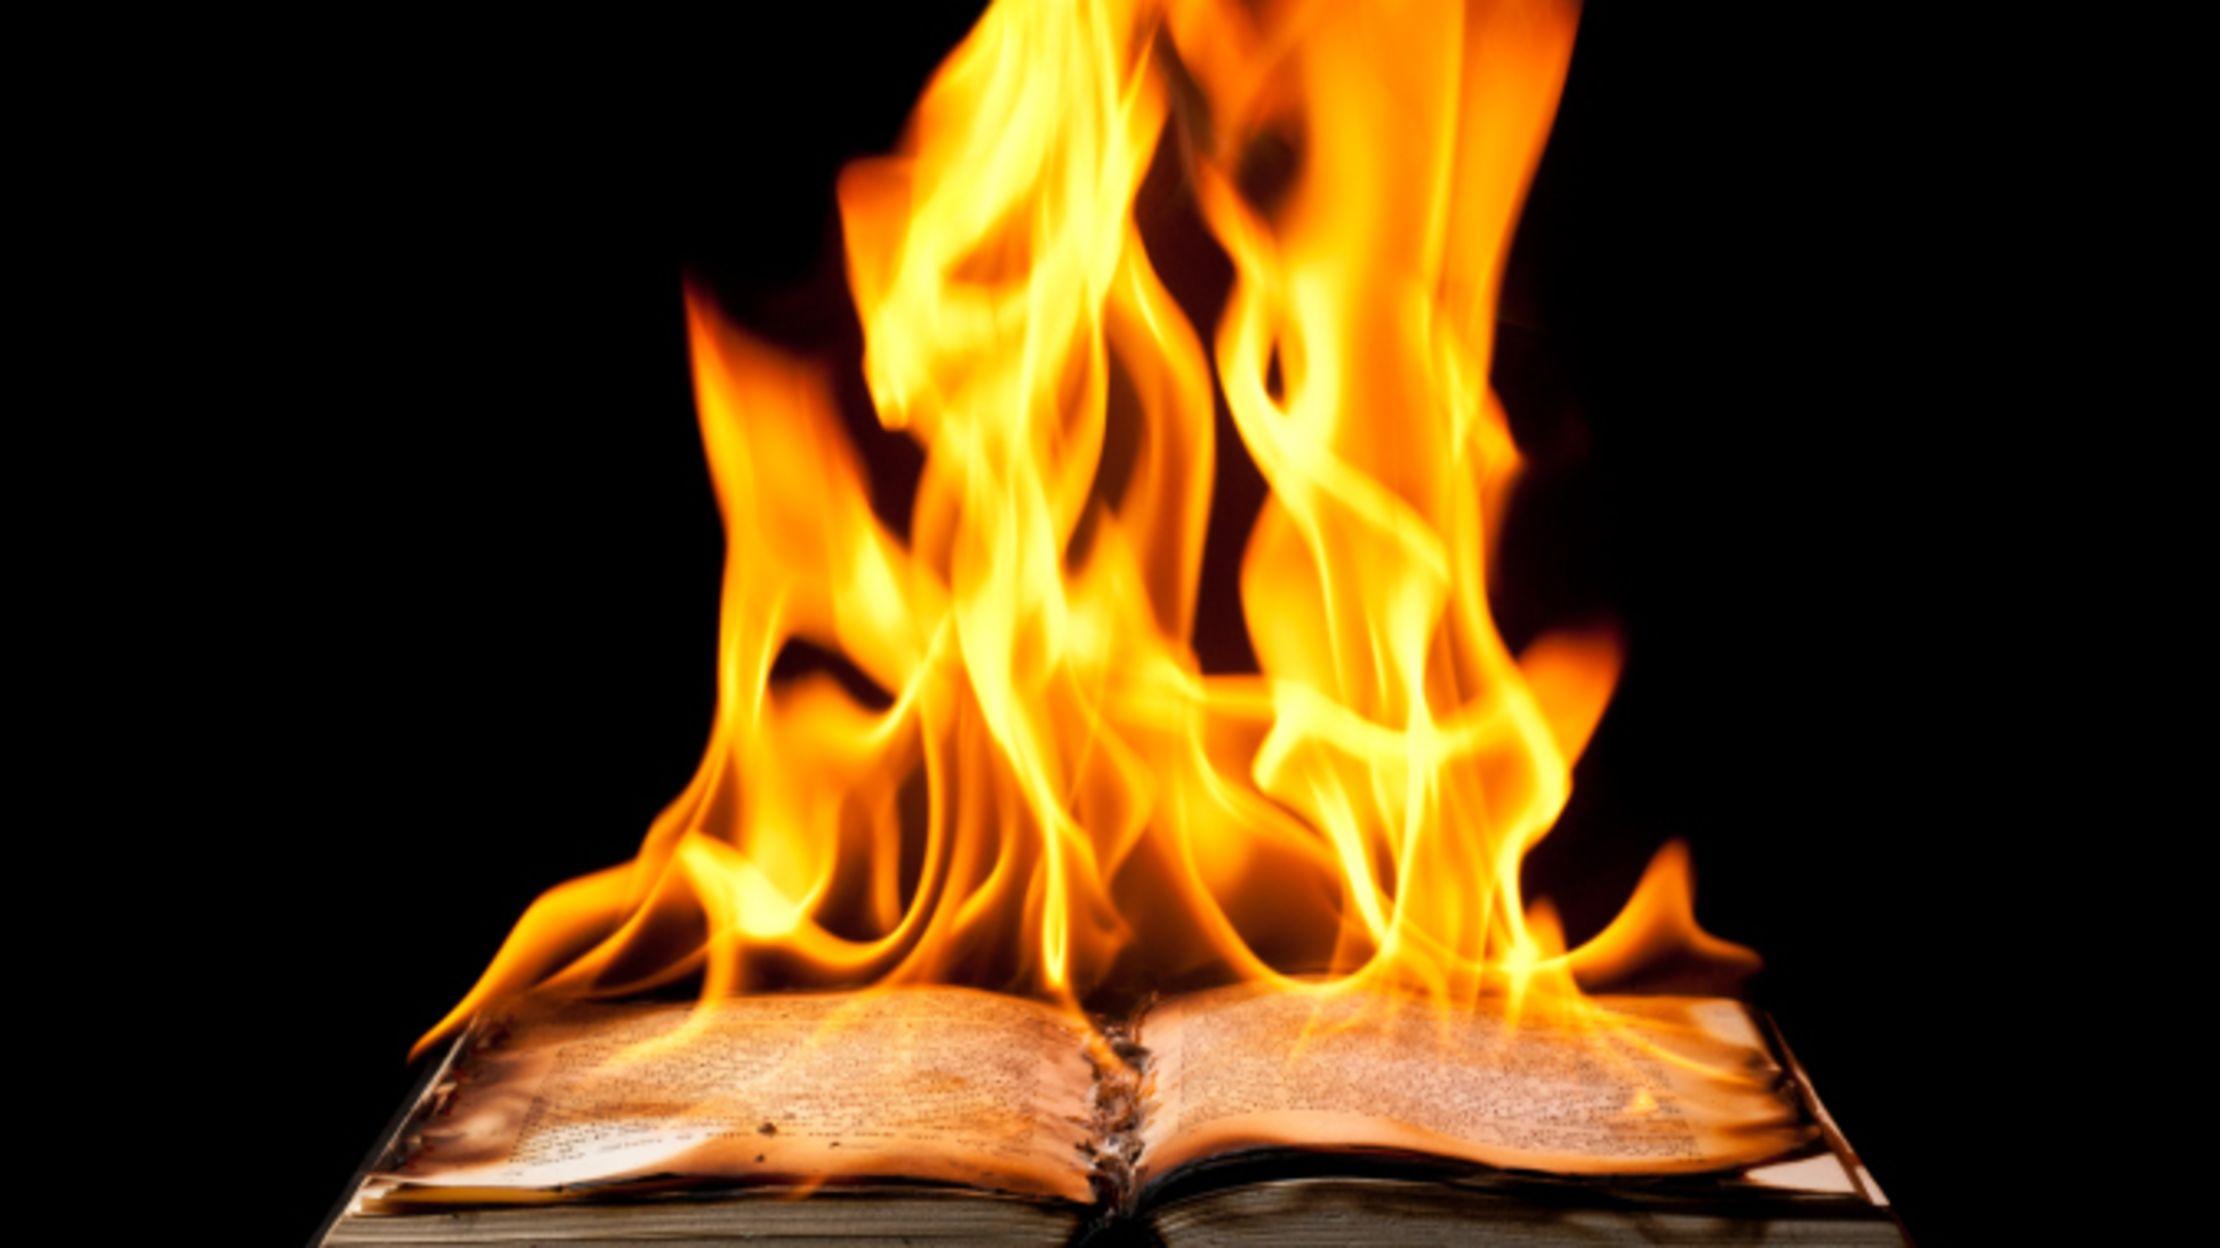 11 Book Burning Stories That Will Break Your Heart | Mental Floss